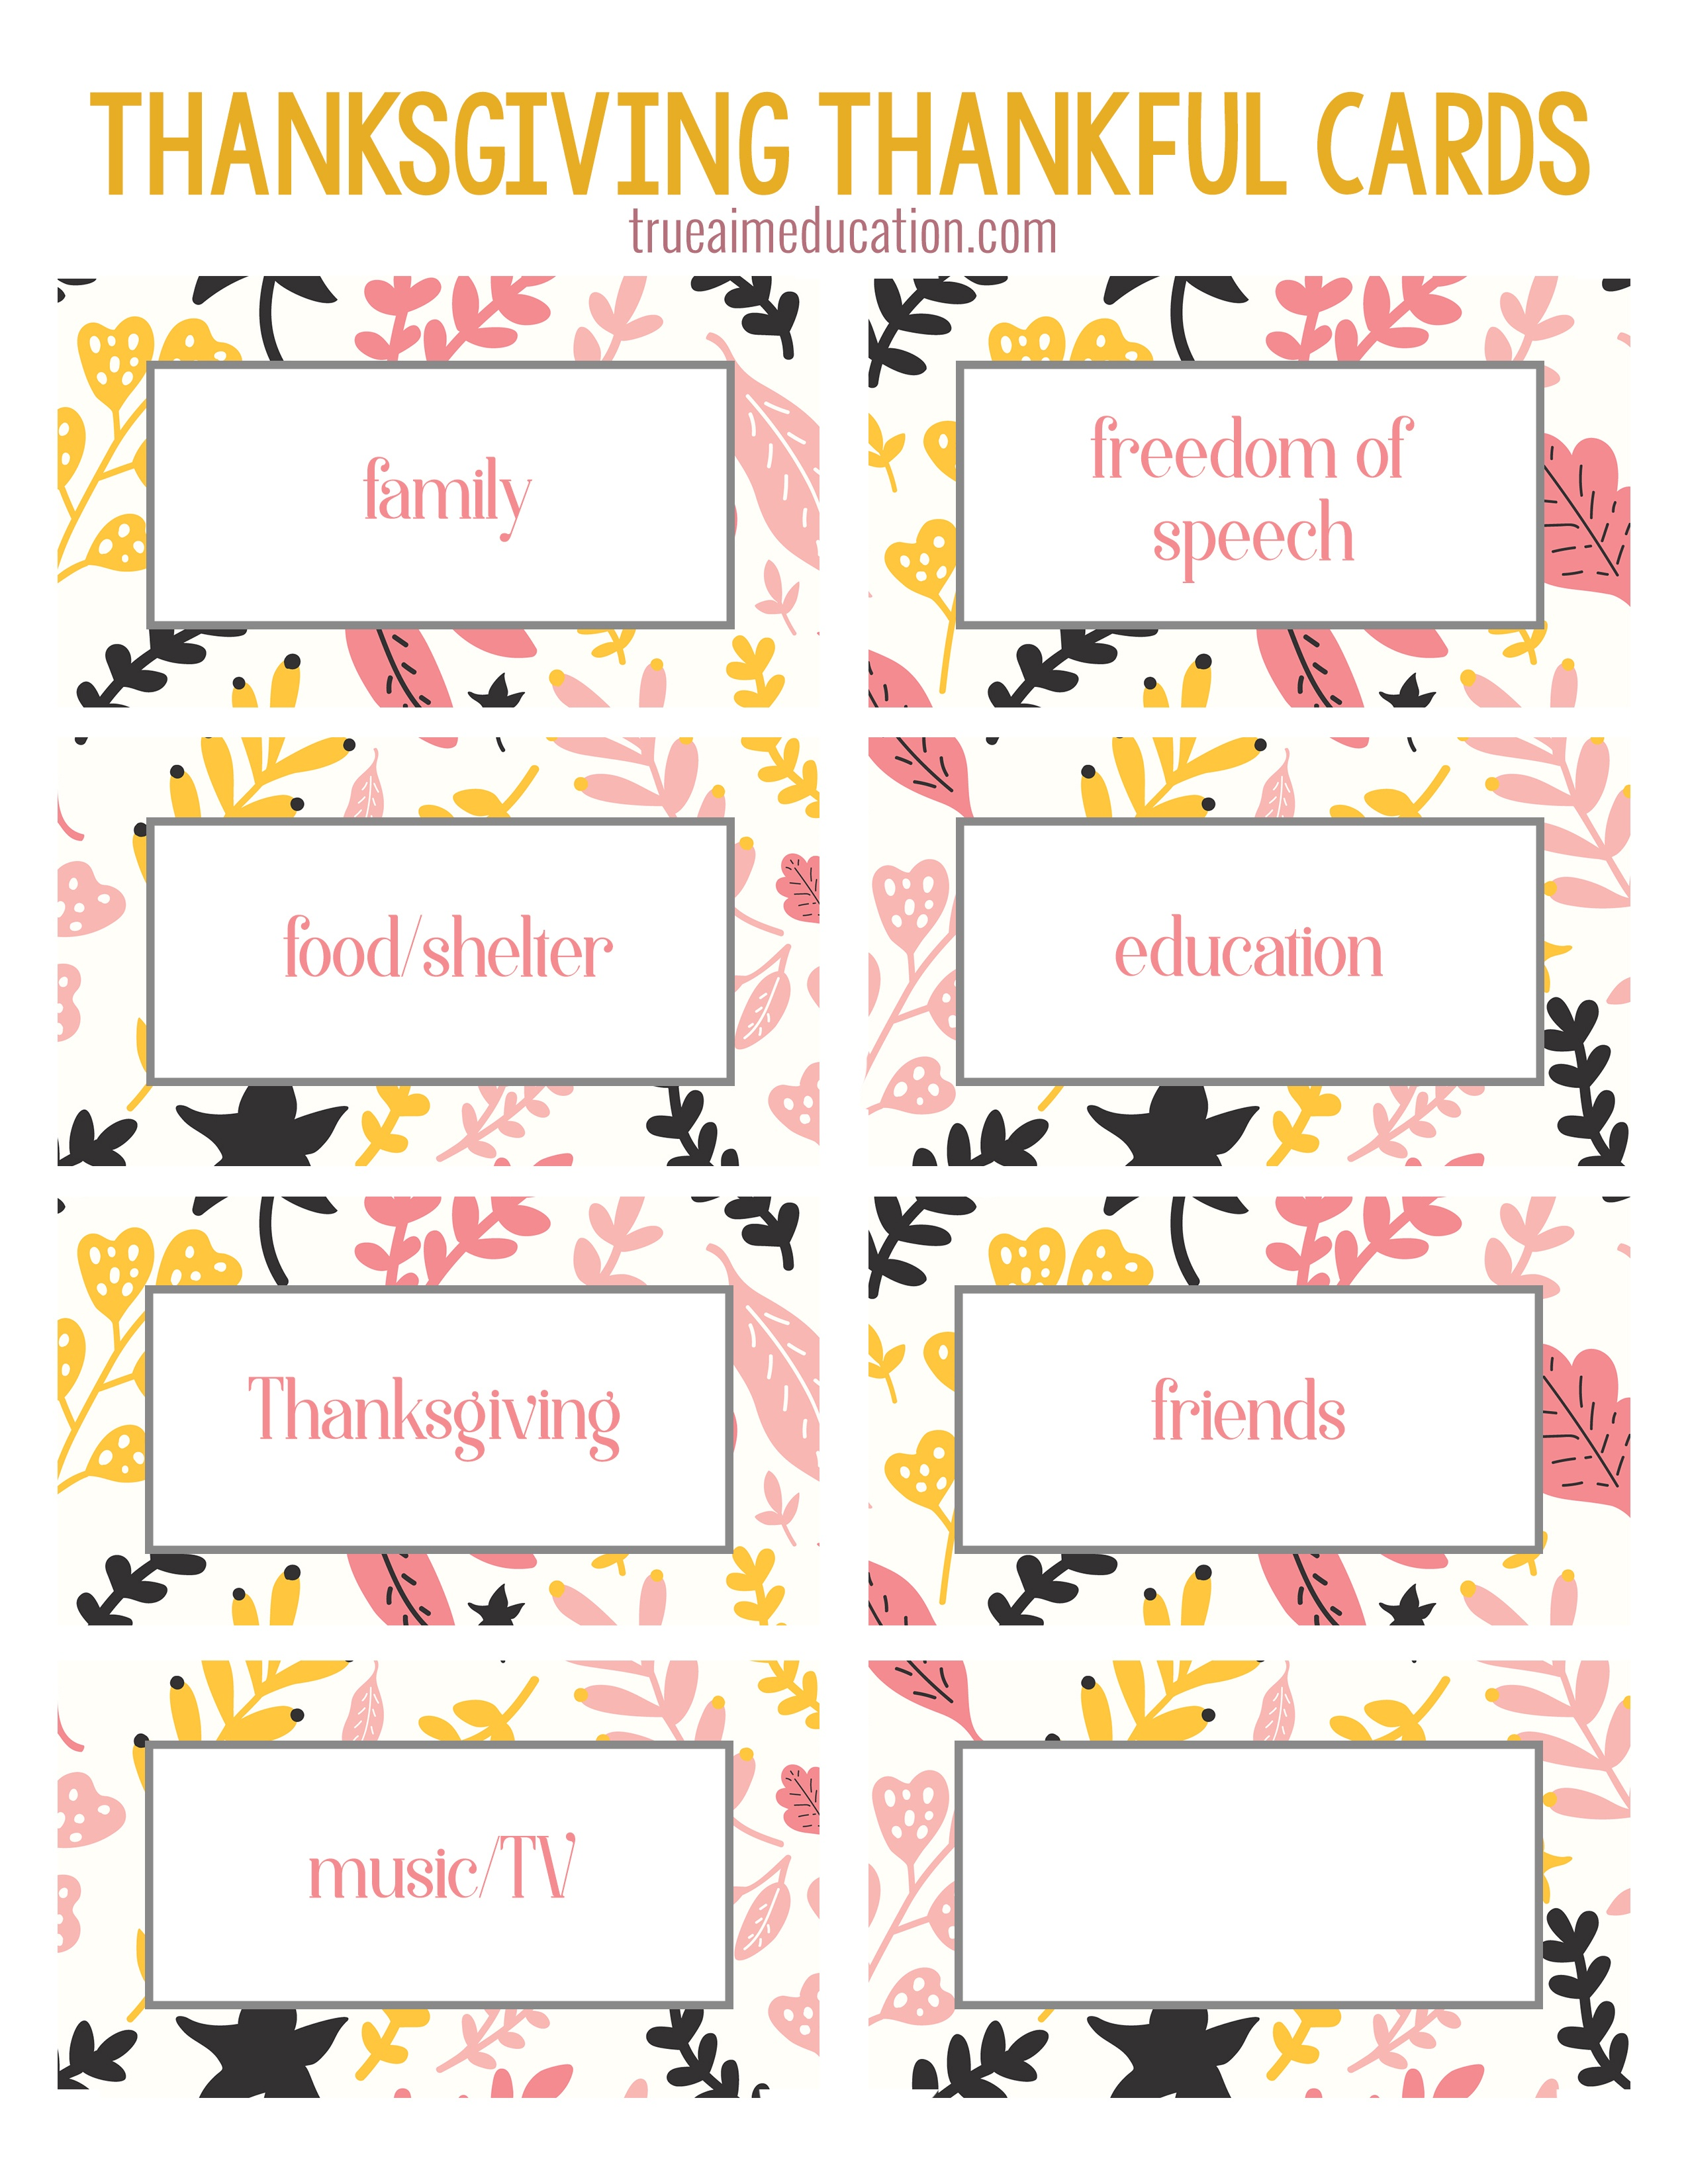 Thanksgiving Thankfulness With Free Printable Cards - Free Printable Cards